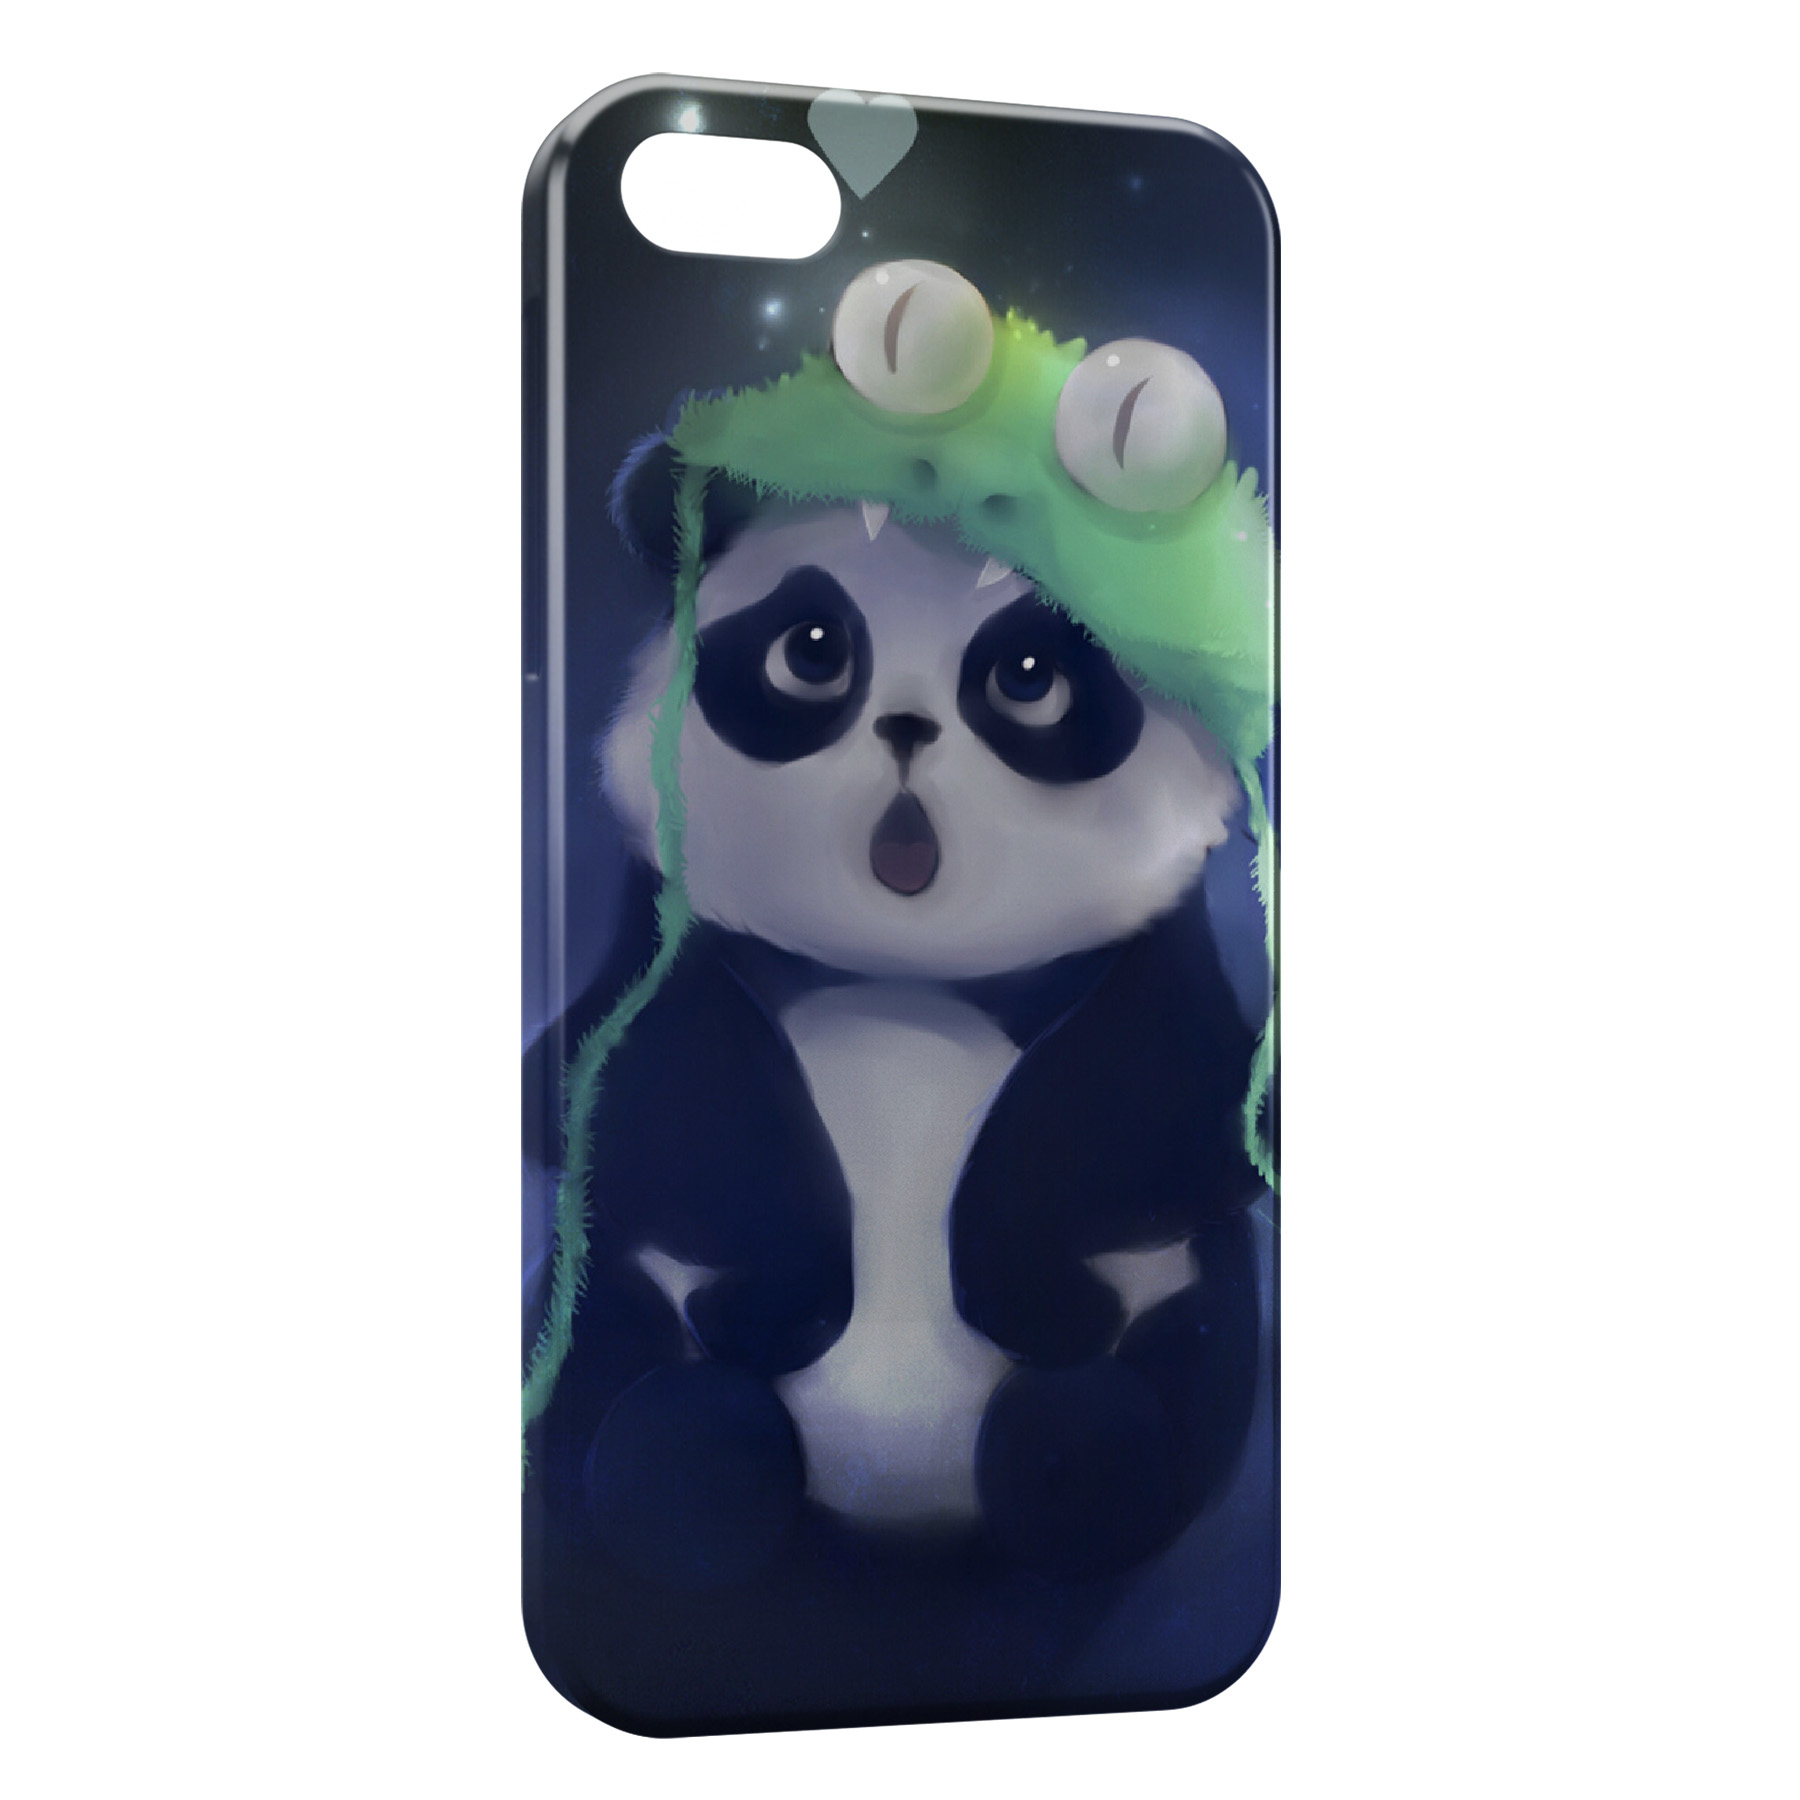 Coque iPhone 6 Plus & 6S Plus Panda Kawaii Cute 2